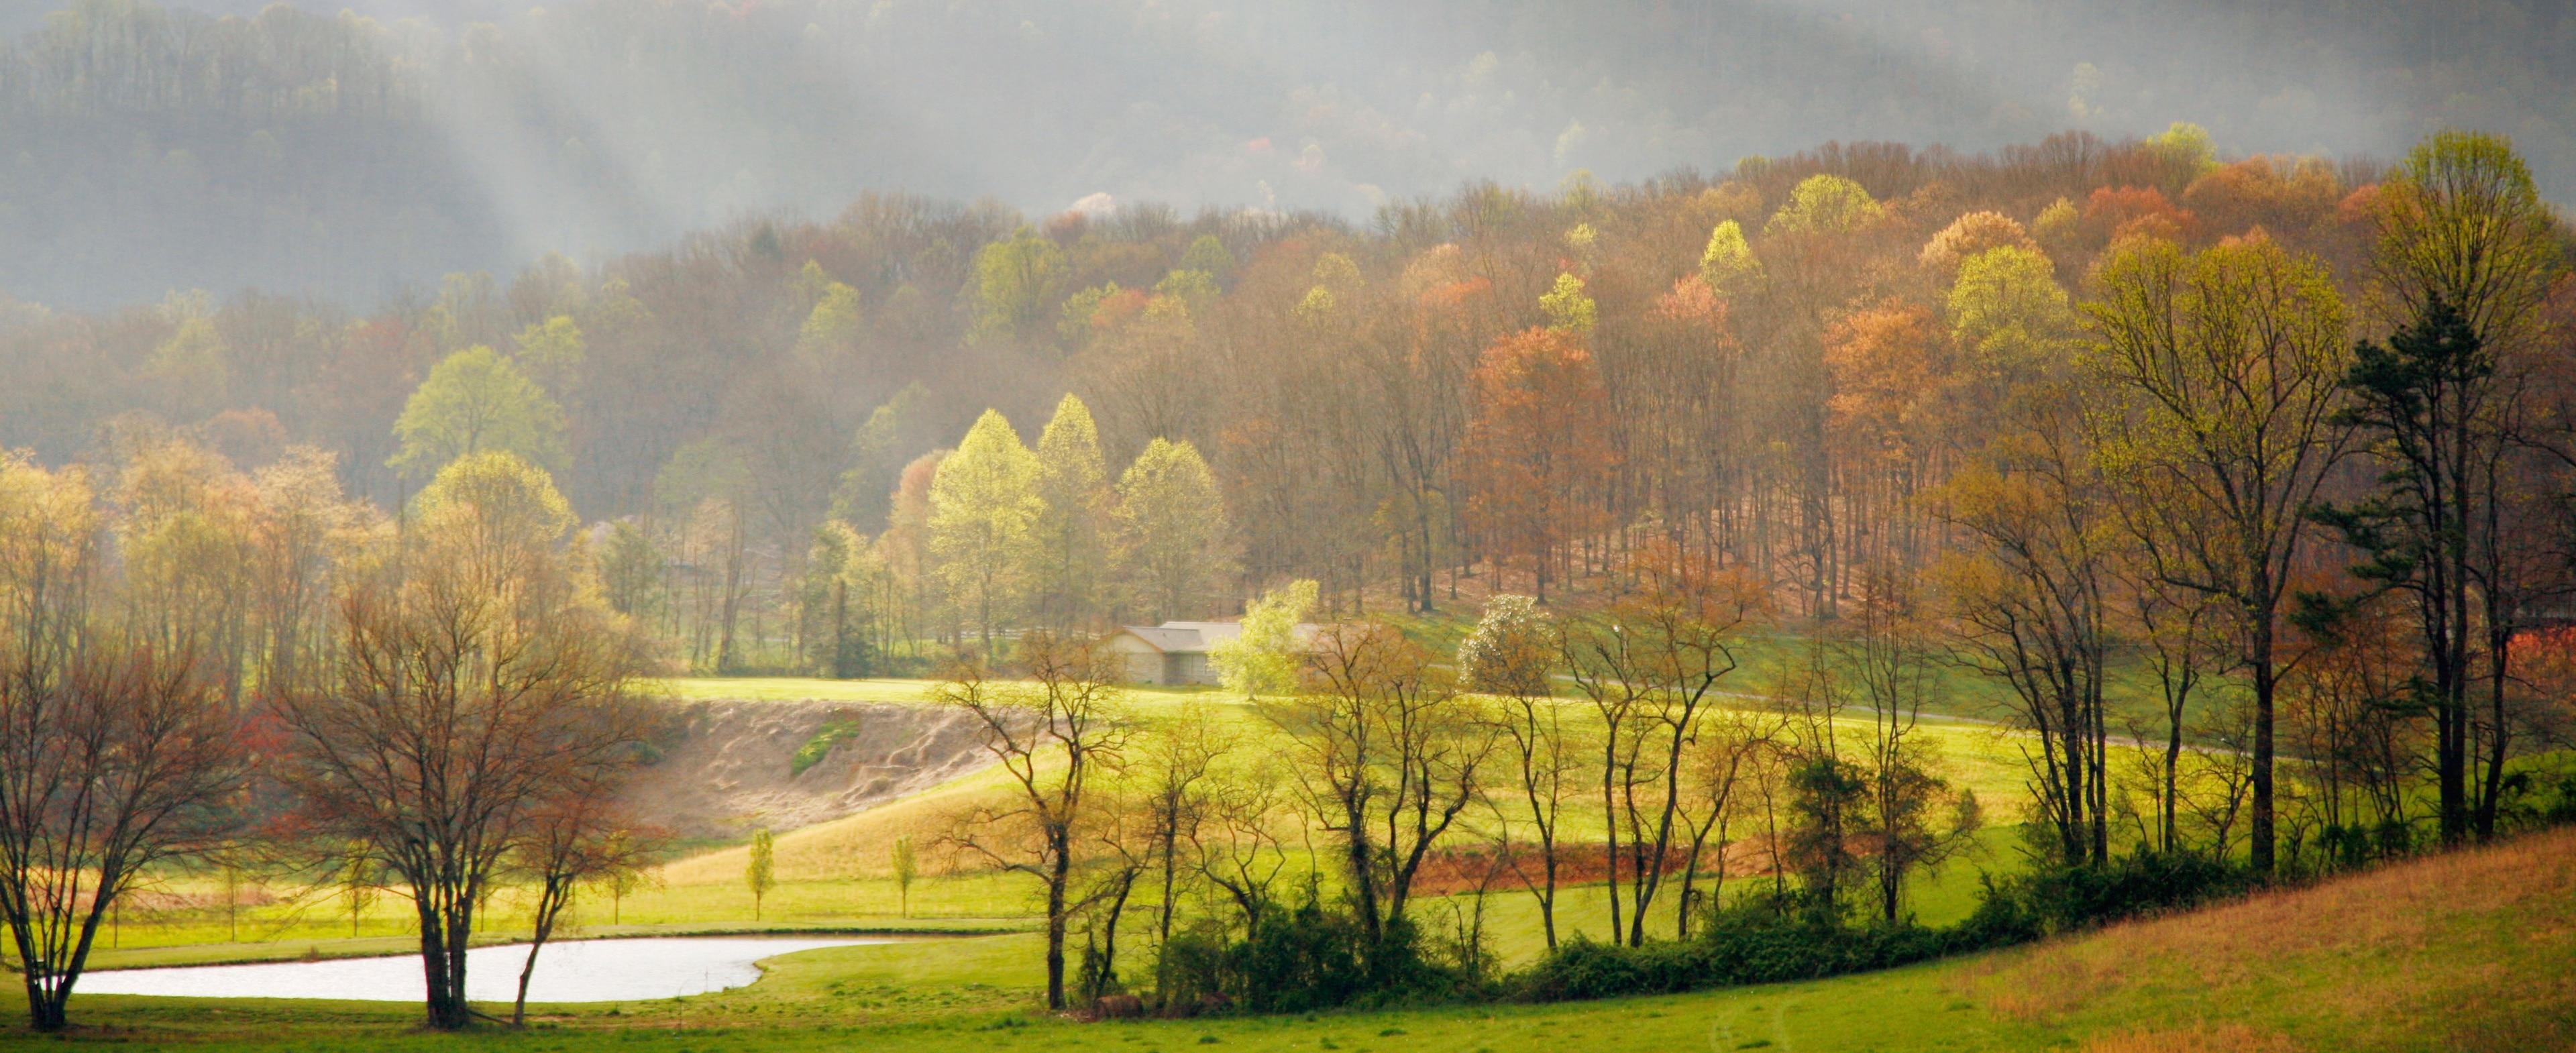 Highlands, North Carolina, United States of America